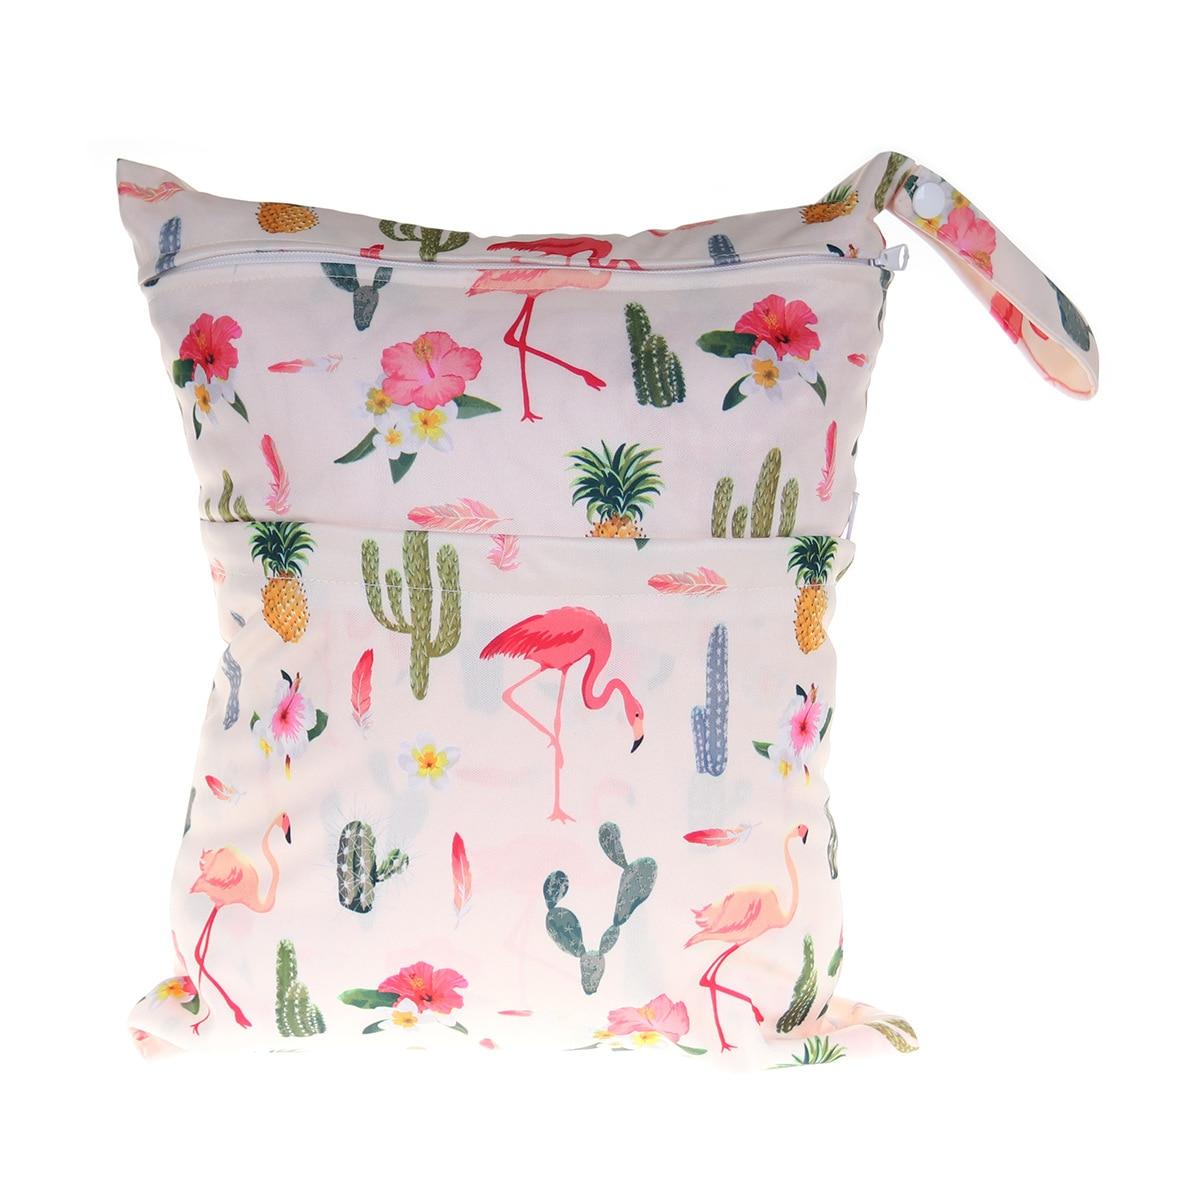 Paradise Snap Closure-Double Zipper Printed Diaper Bag Waterproof Bag-Crane